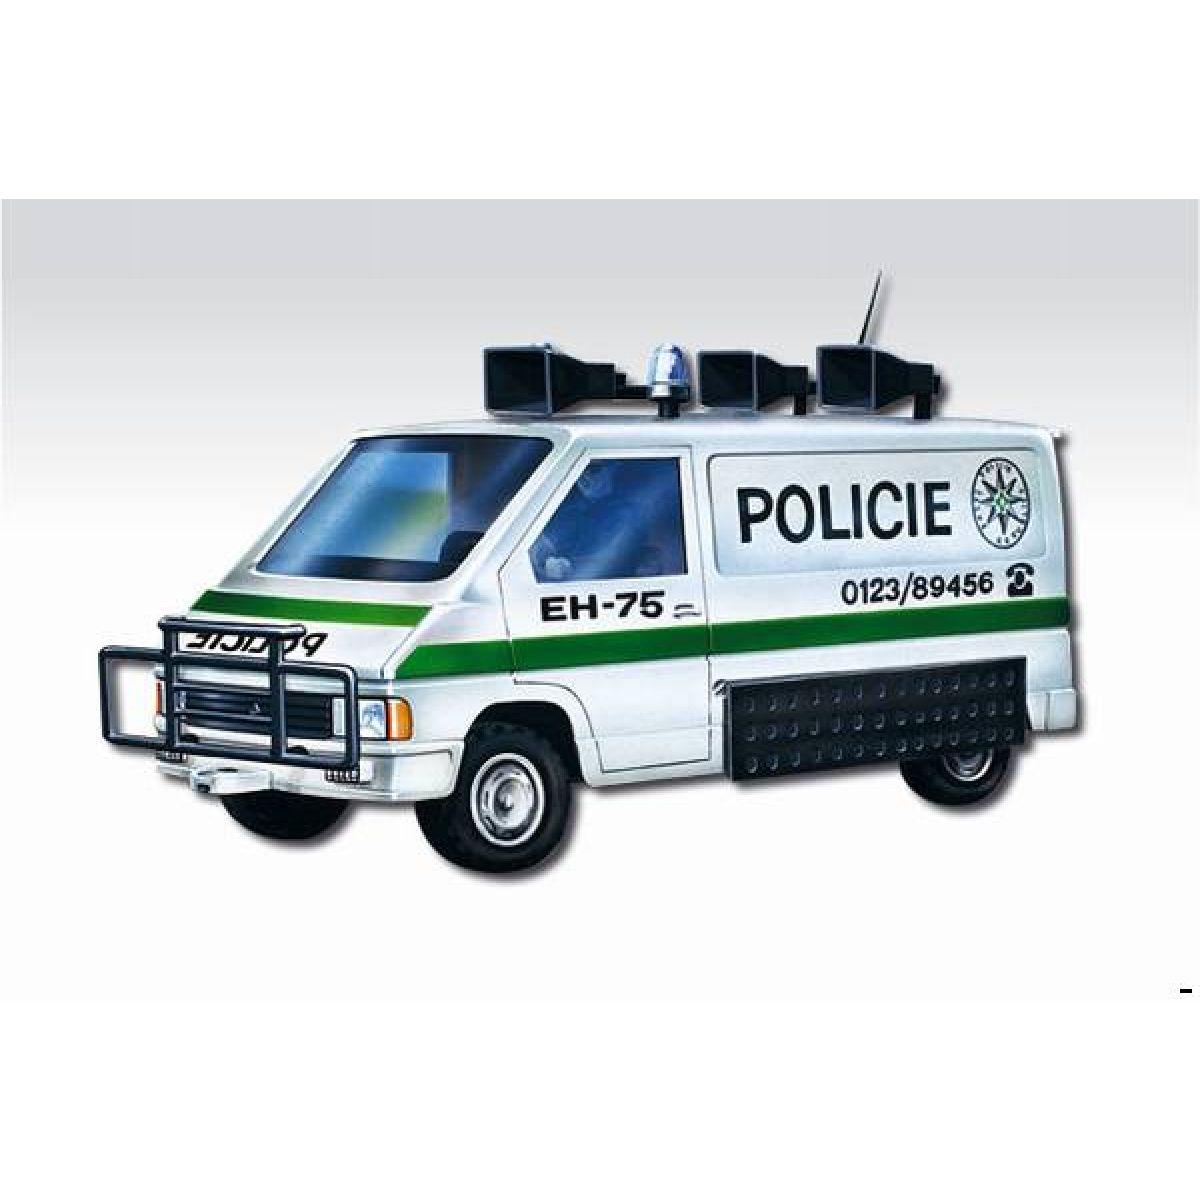 Monti 27 Policie Vista